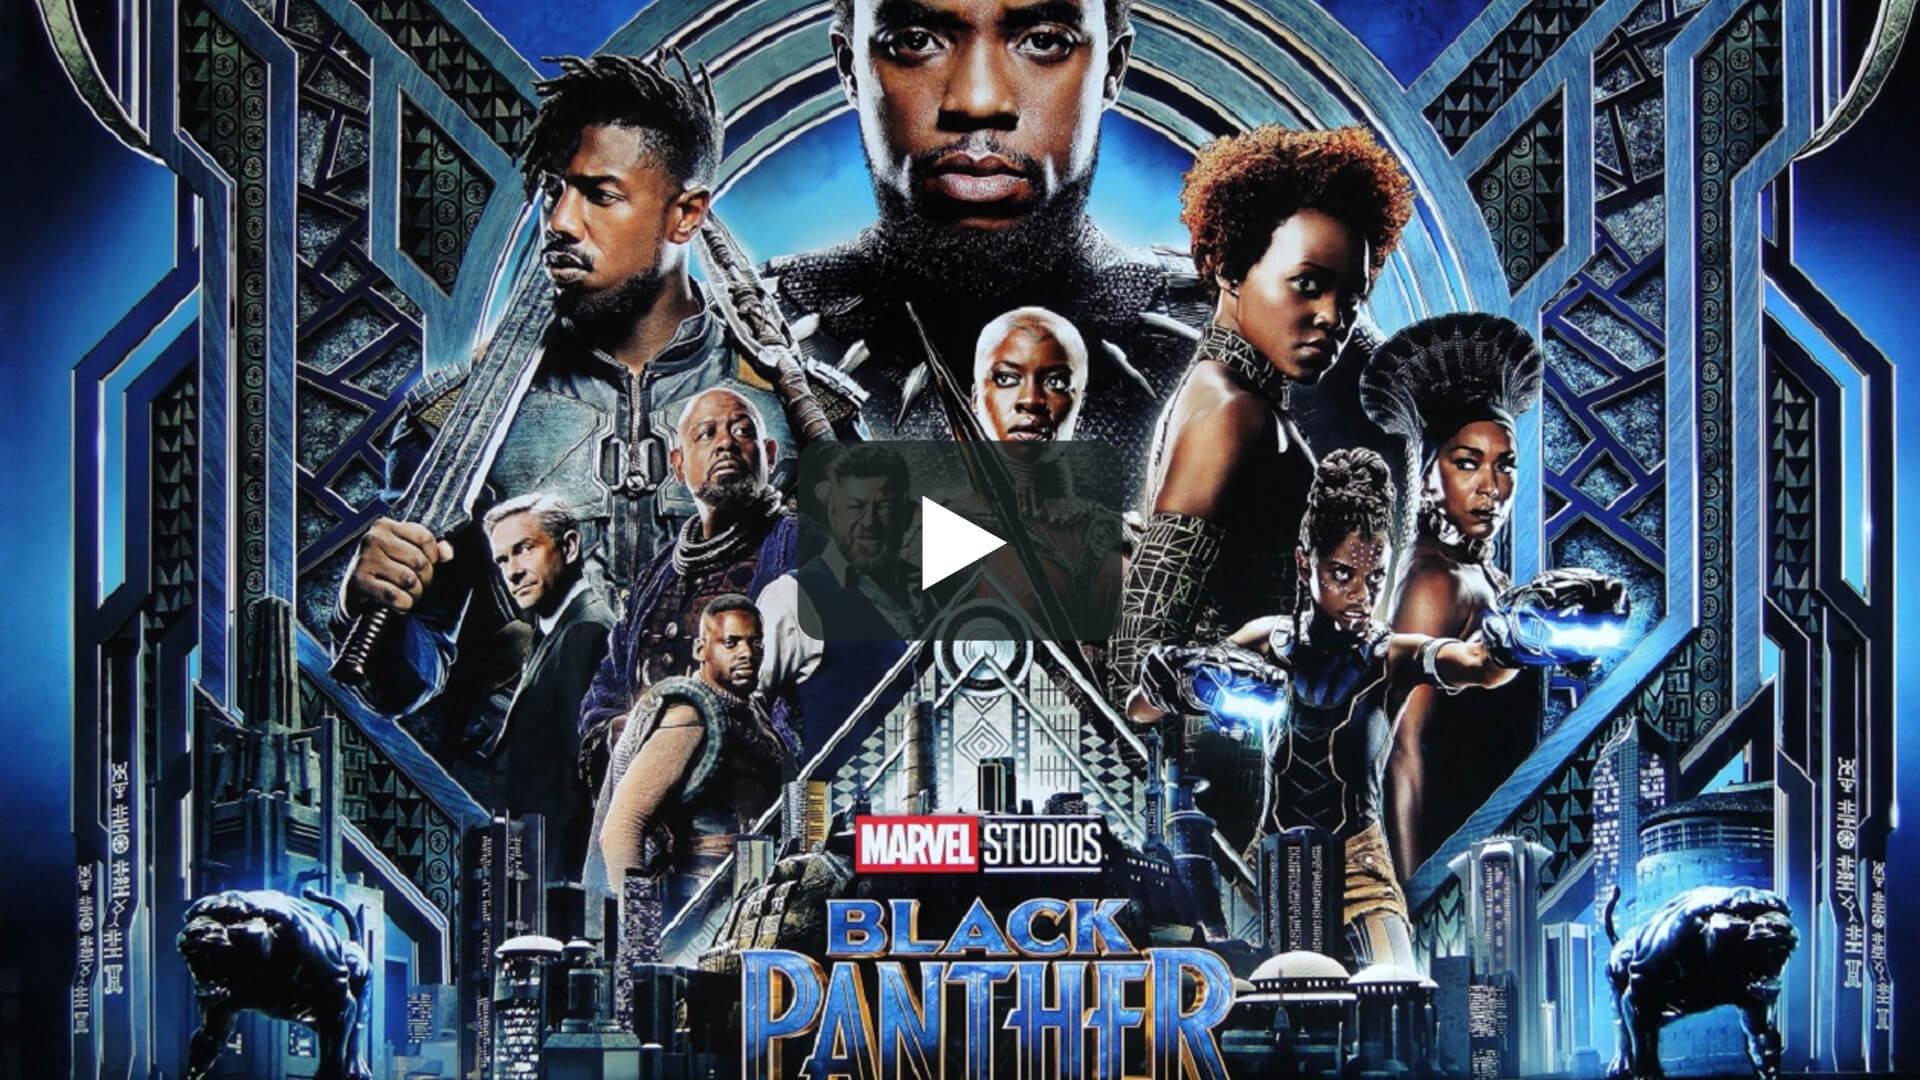 Black Panther - 黑豹